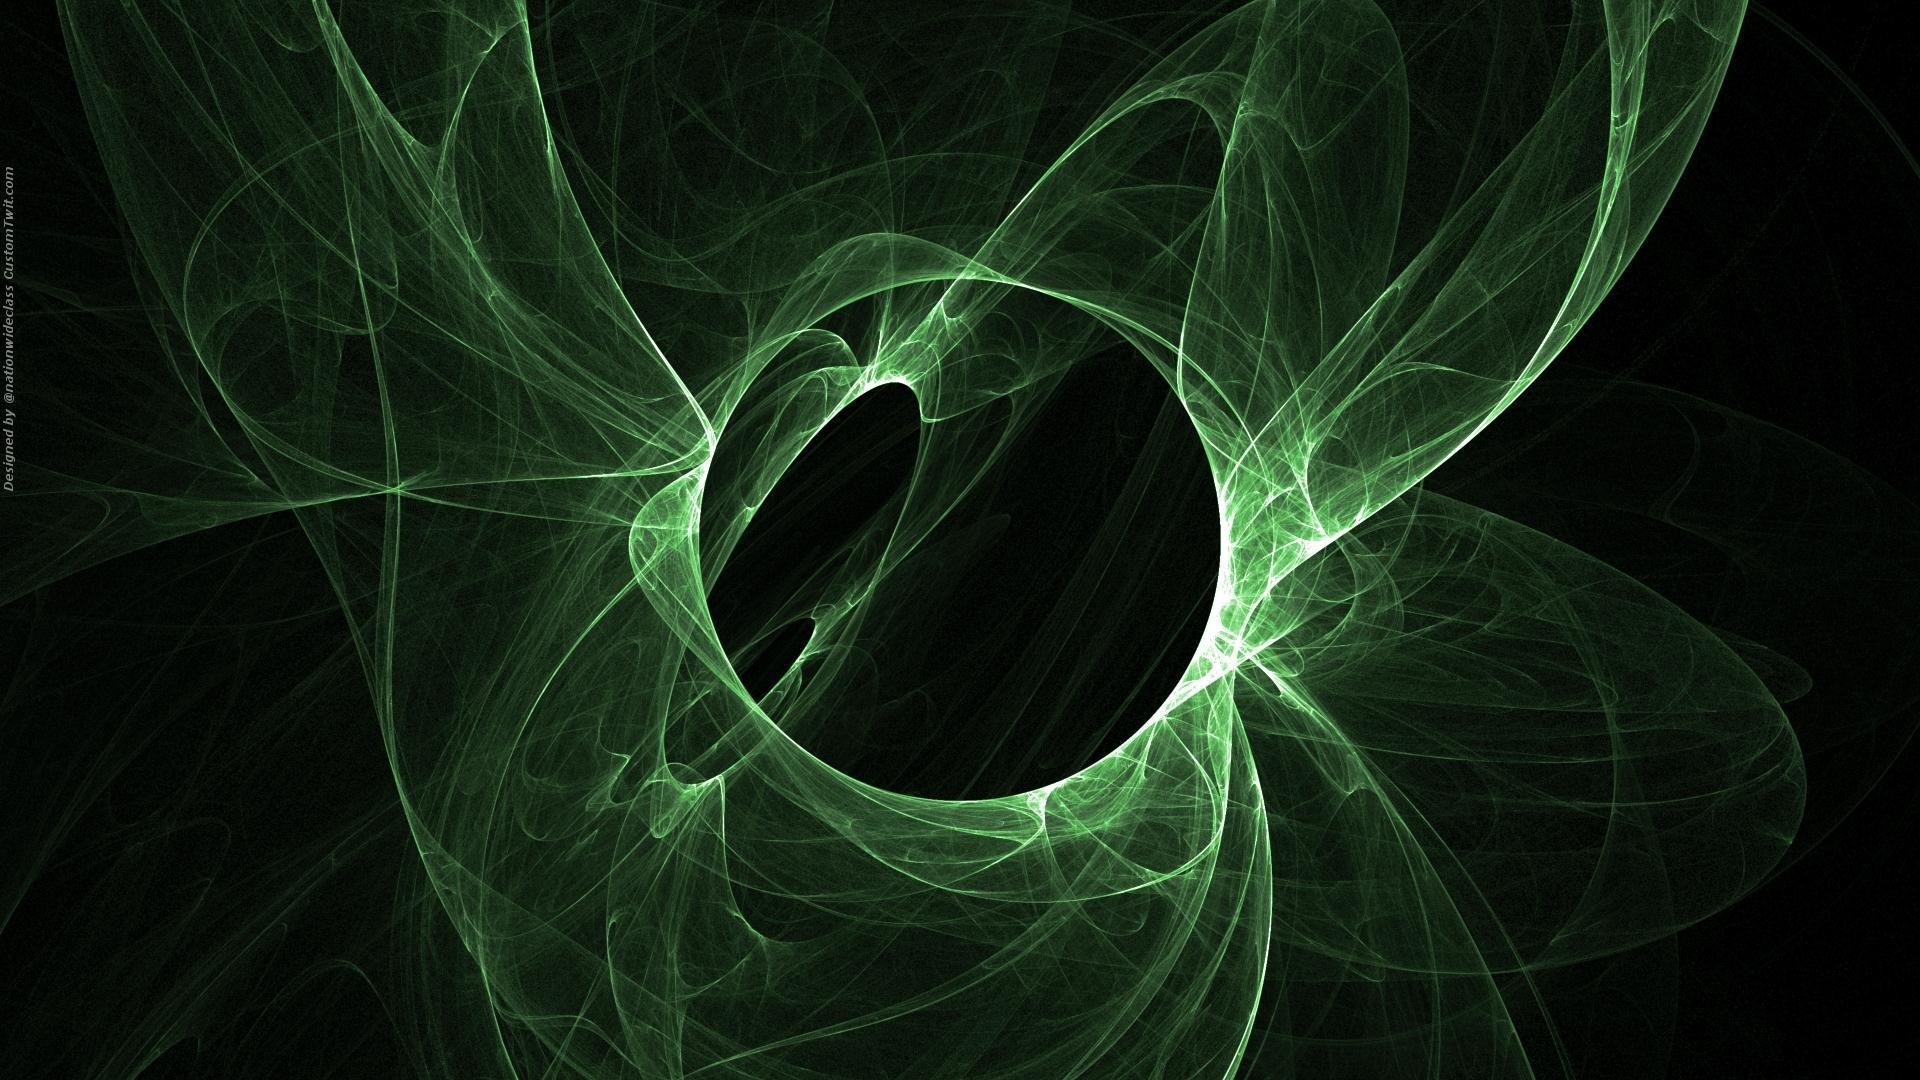 green dell desktop wallpapers 1600x900 - photo #36